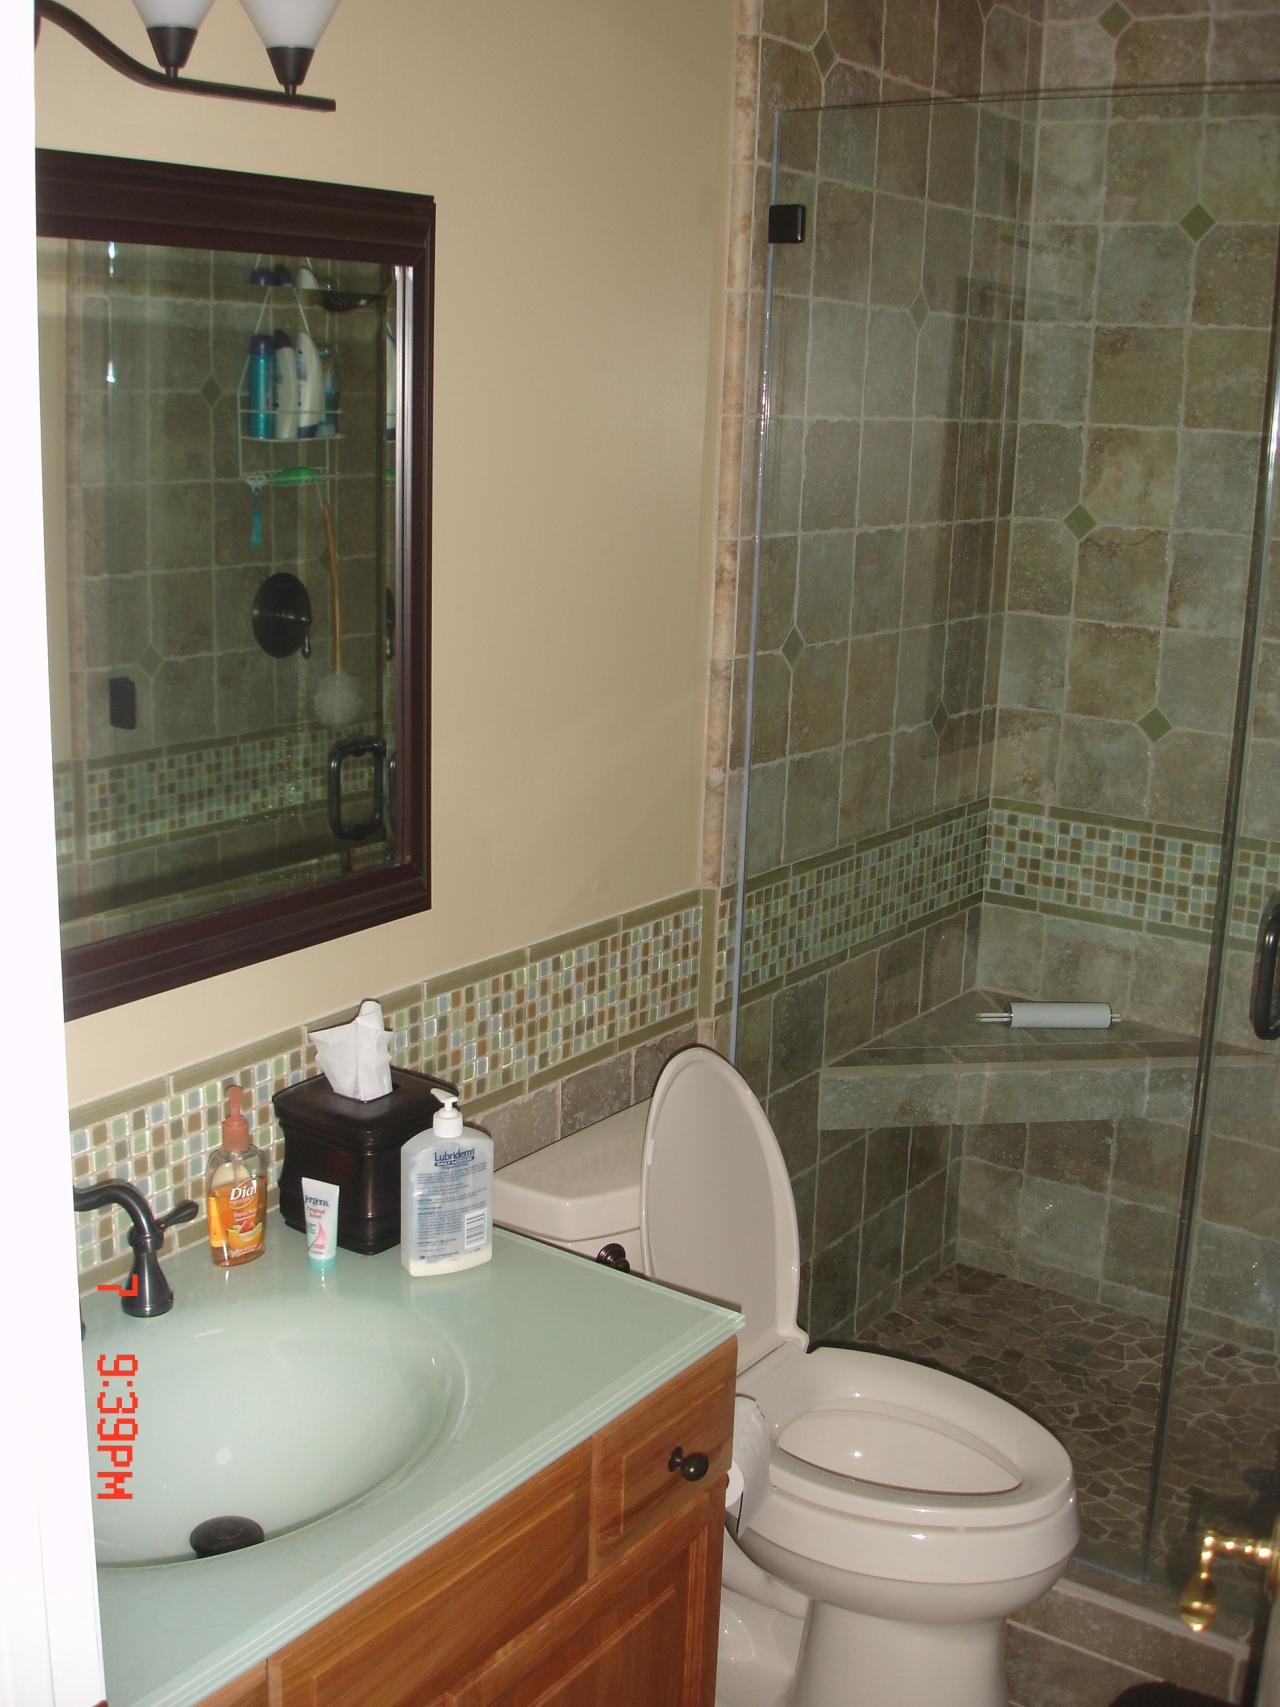 Custom Tile Design And Installation For Bathroom Remodel